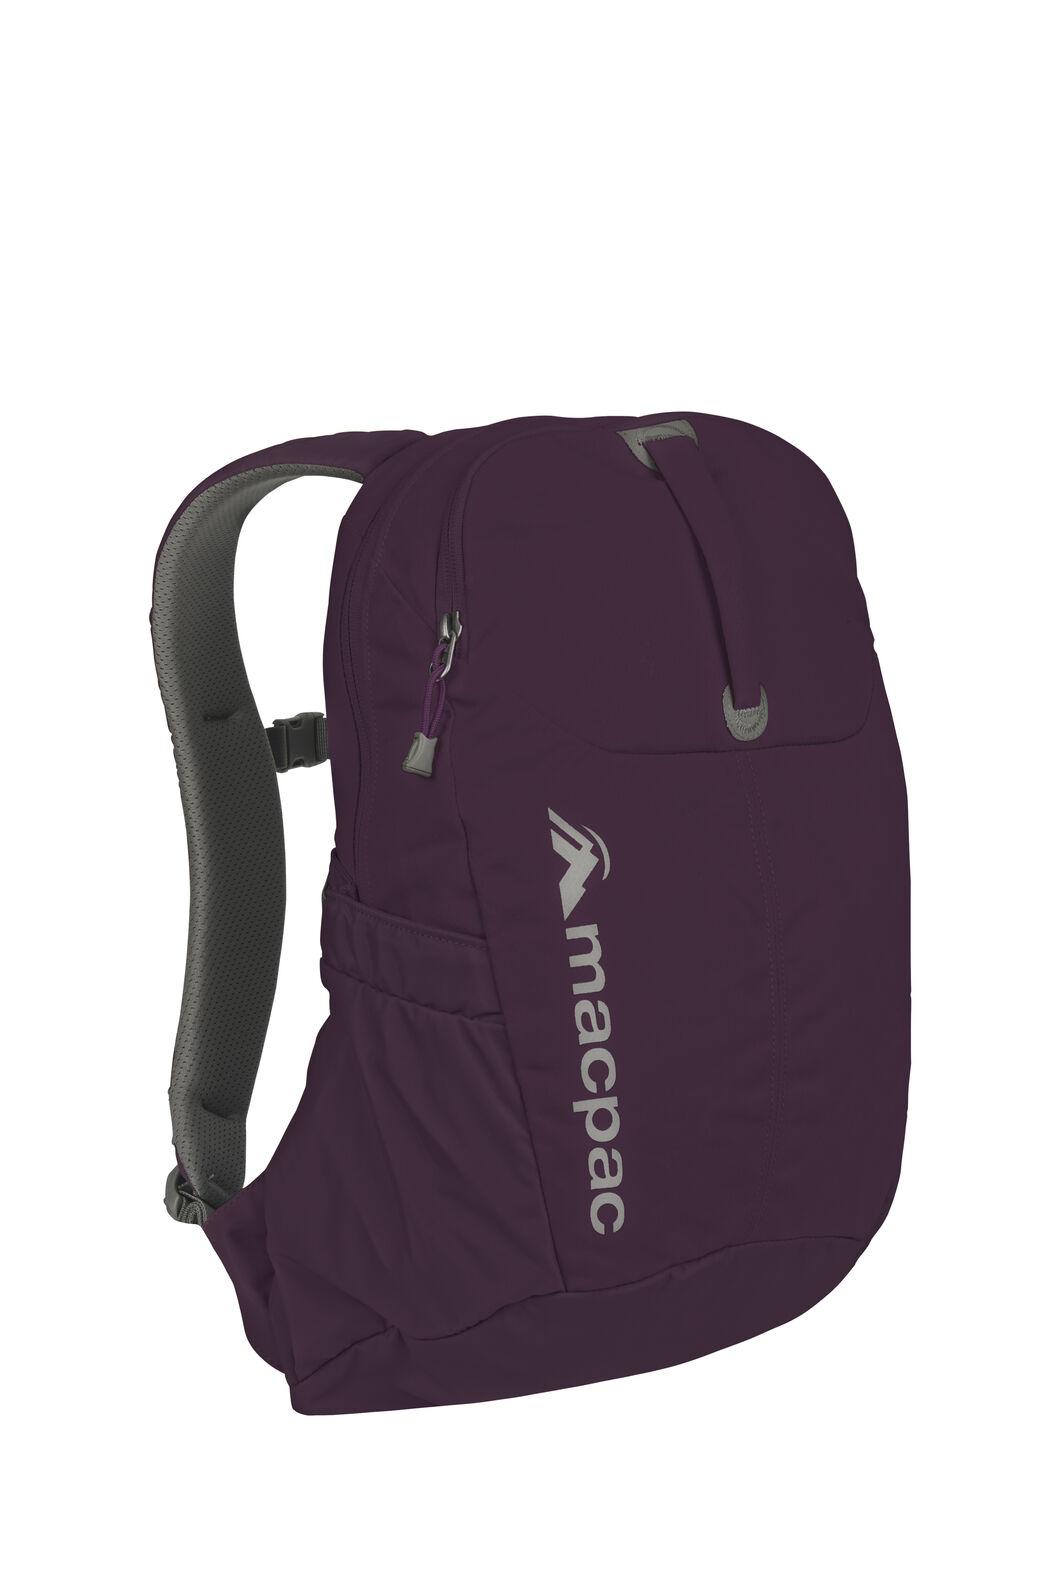 Macpac Korora 16L AzTec® Backpack, Potent Purple, hi-res